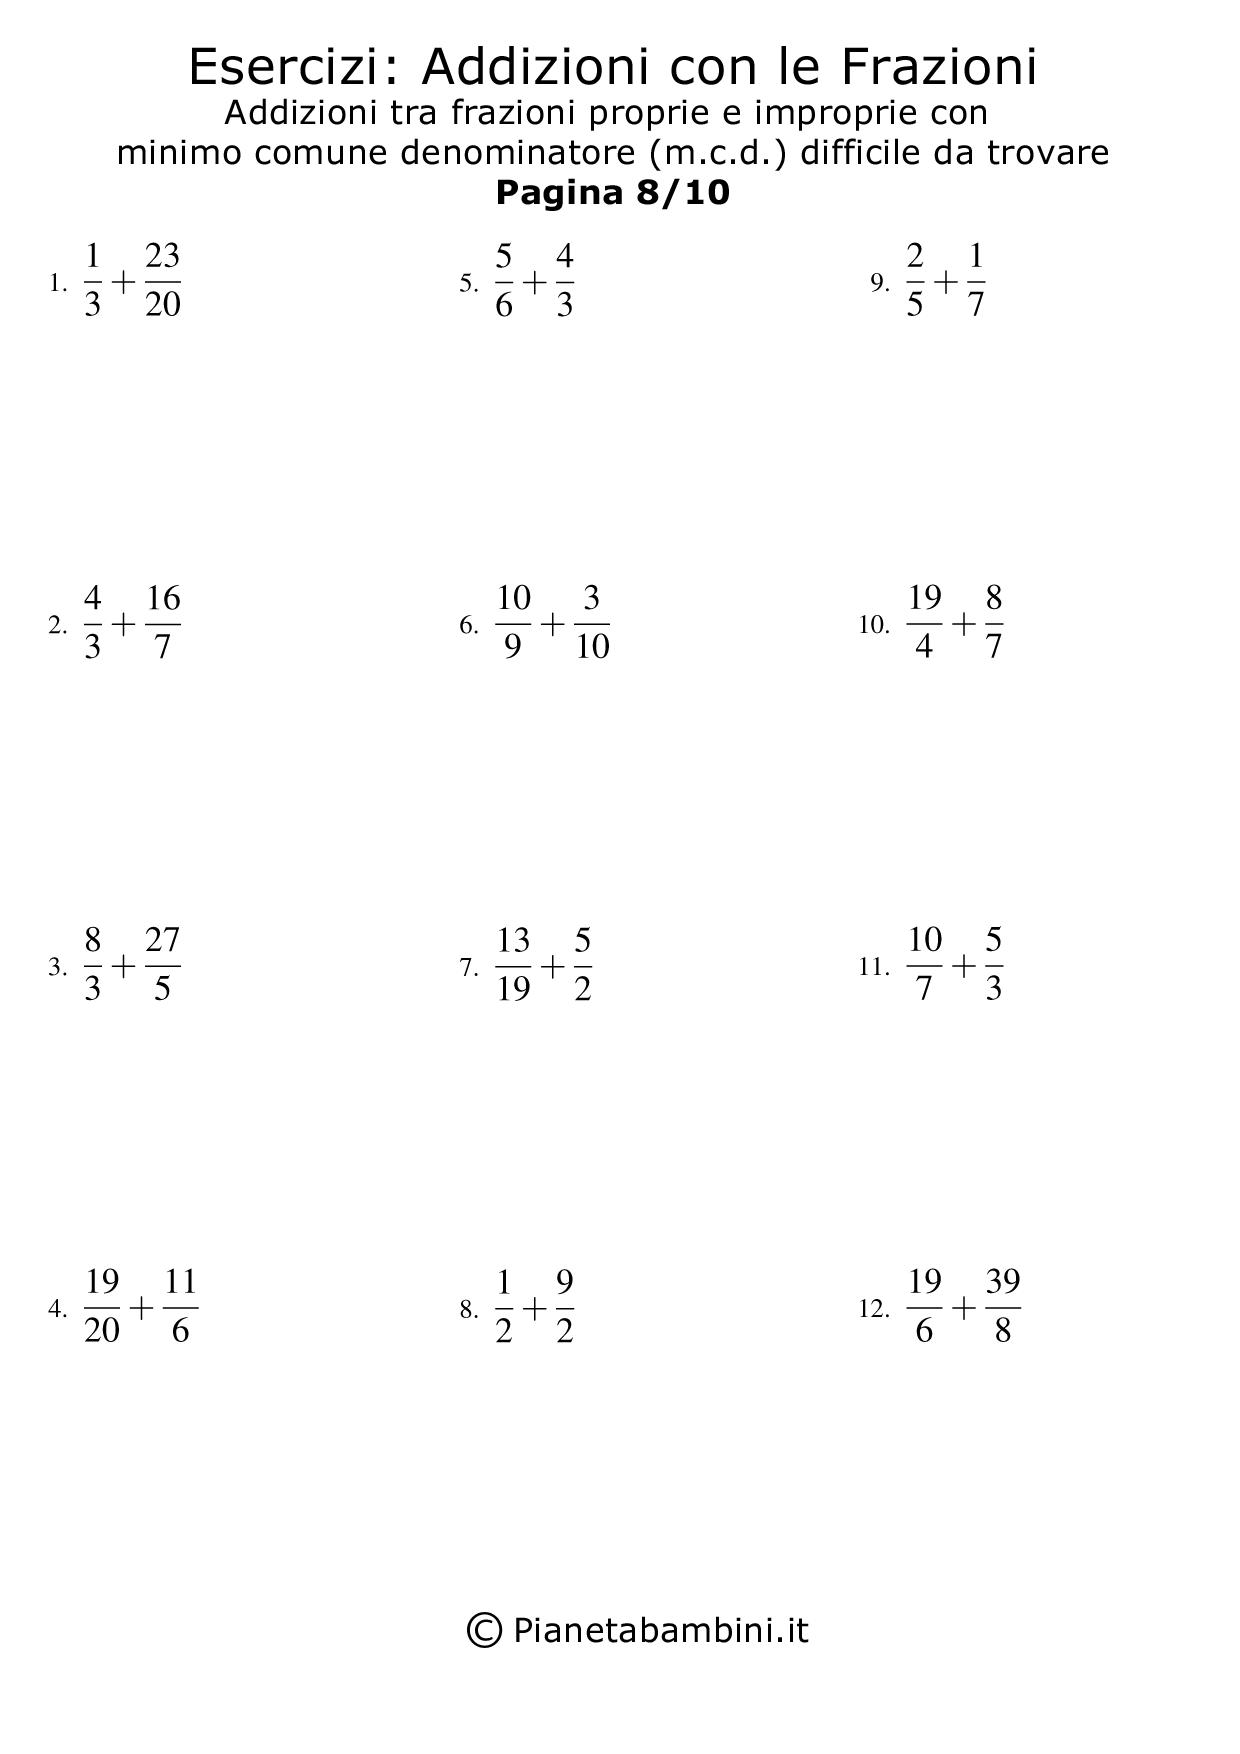 Frazioni-Proprie-Improprie-m.c.d-difficile_08